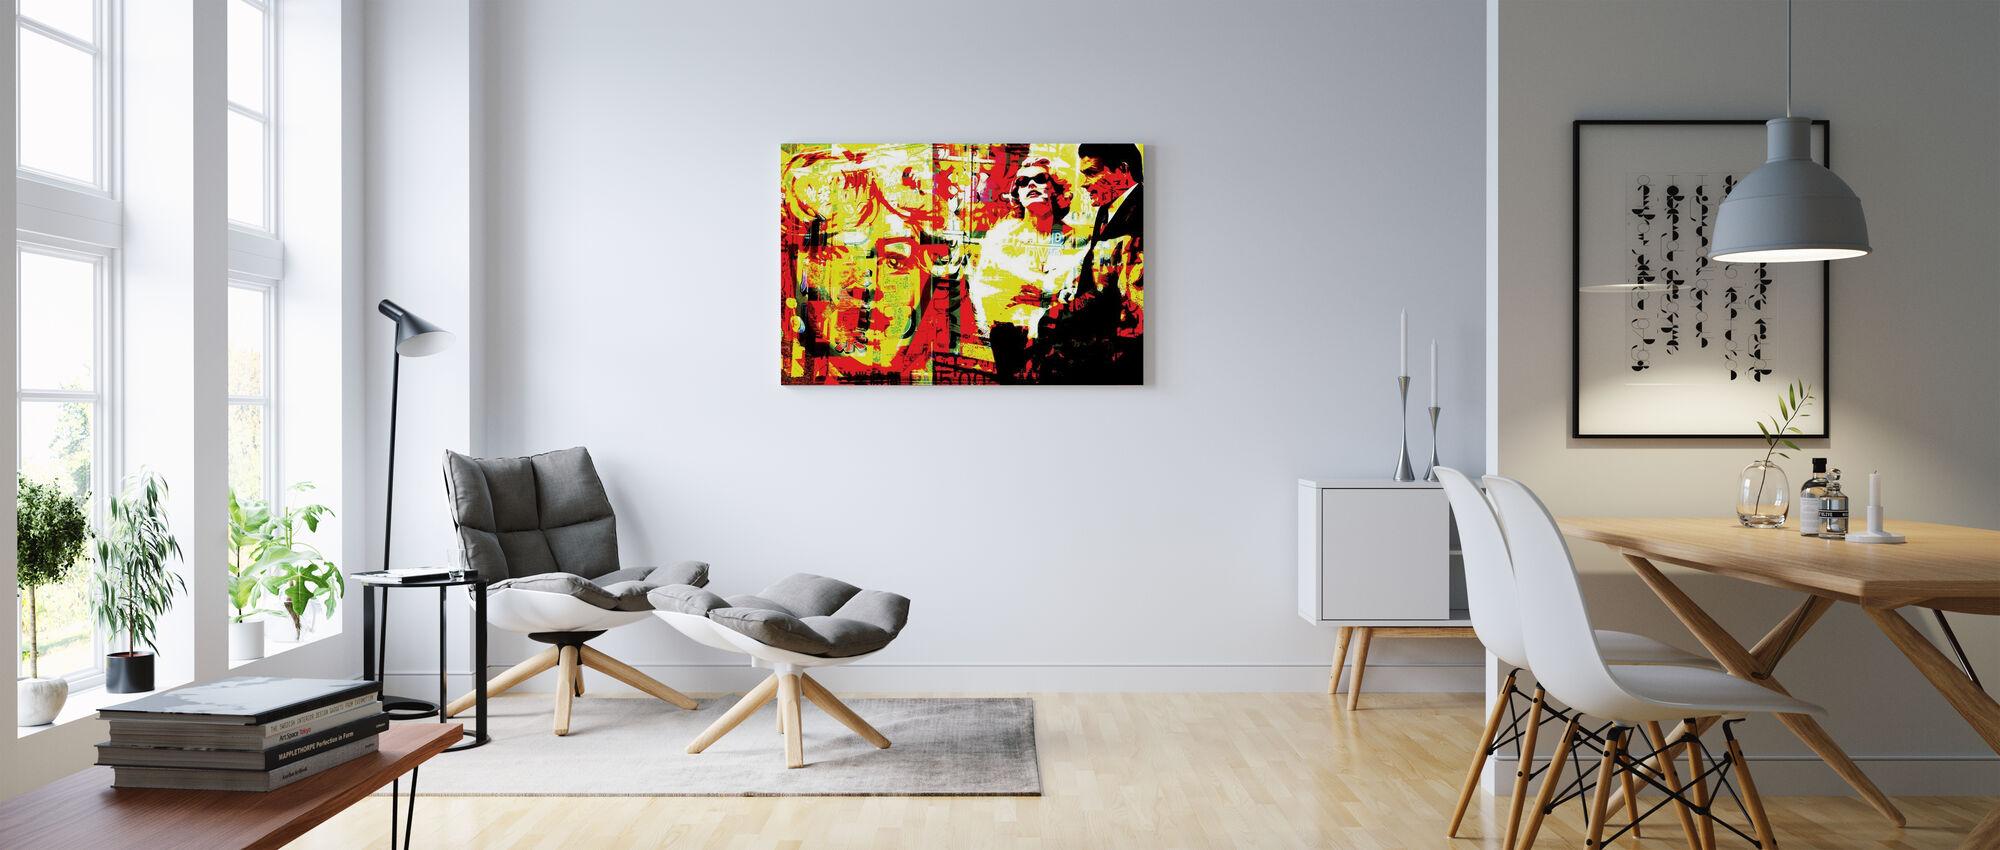 Marilyn-kuvake - Canvastaulu - Olohuone